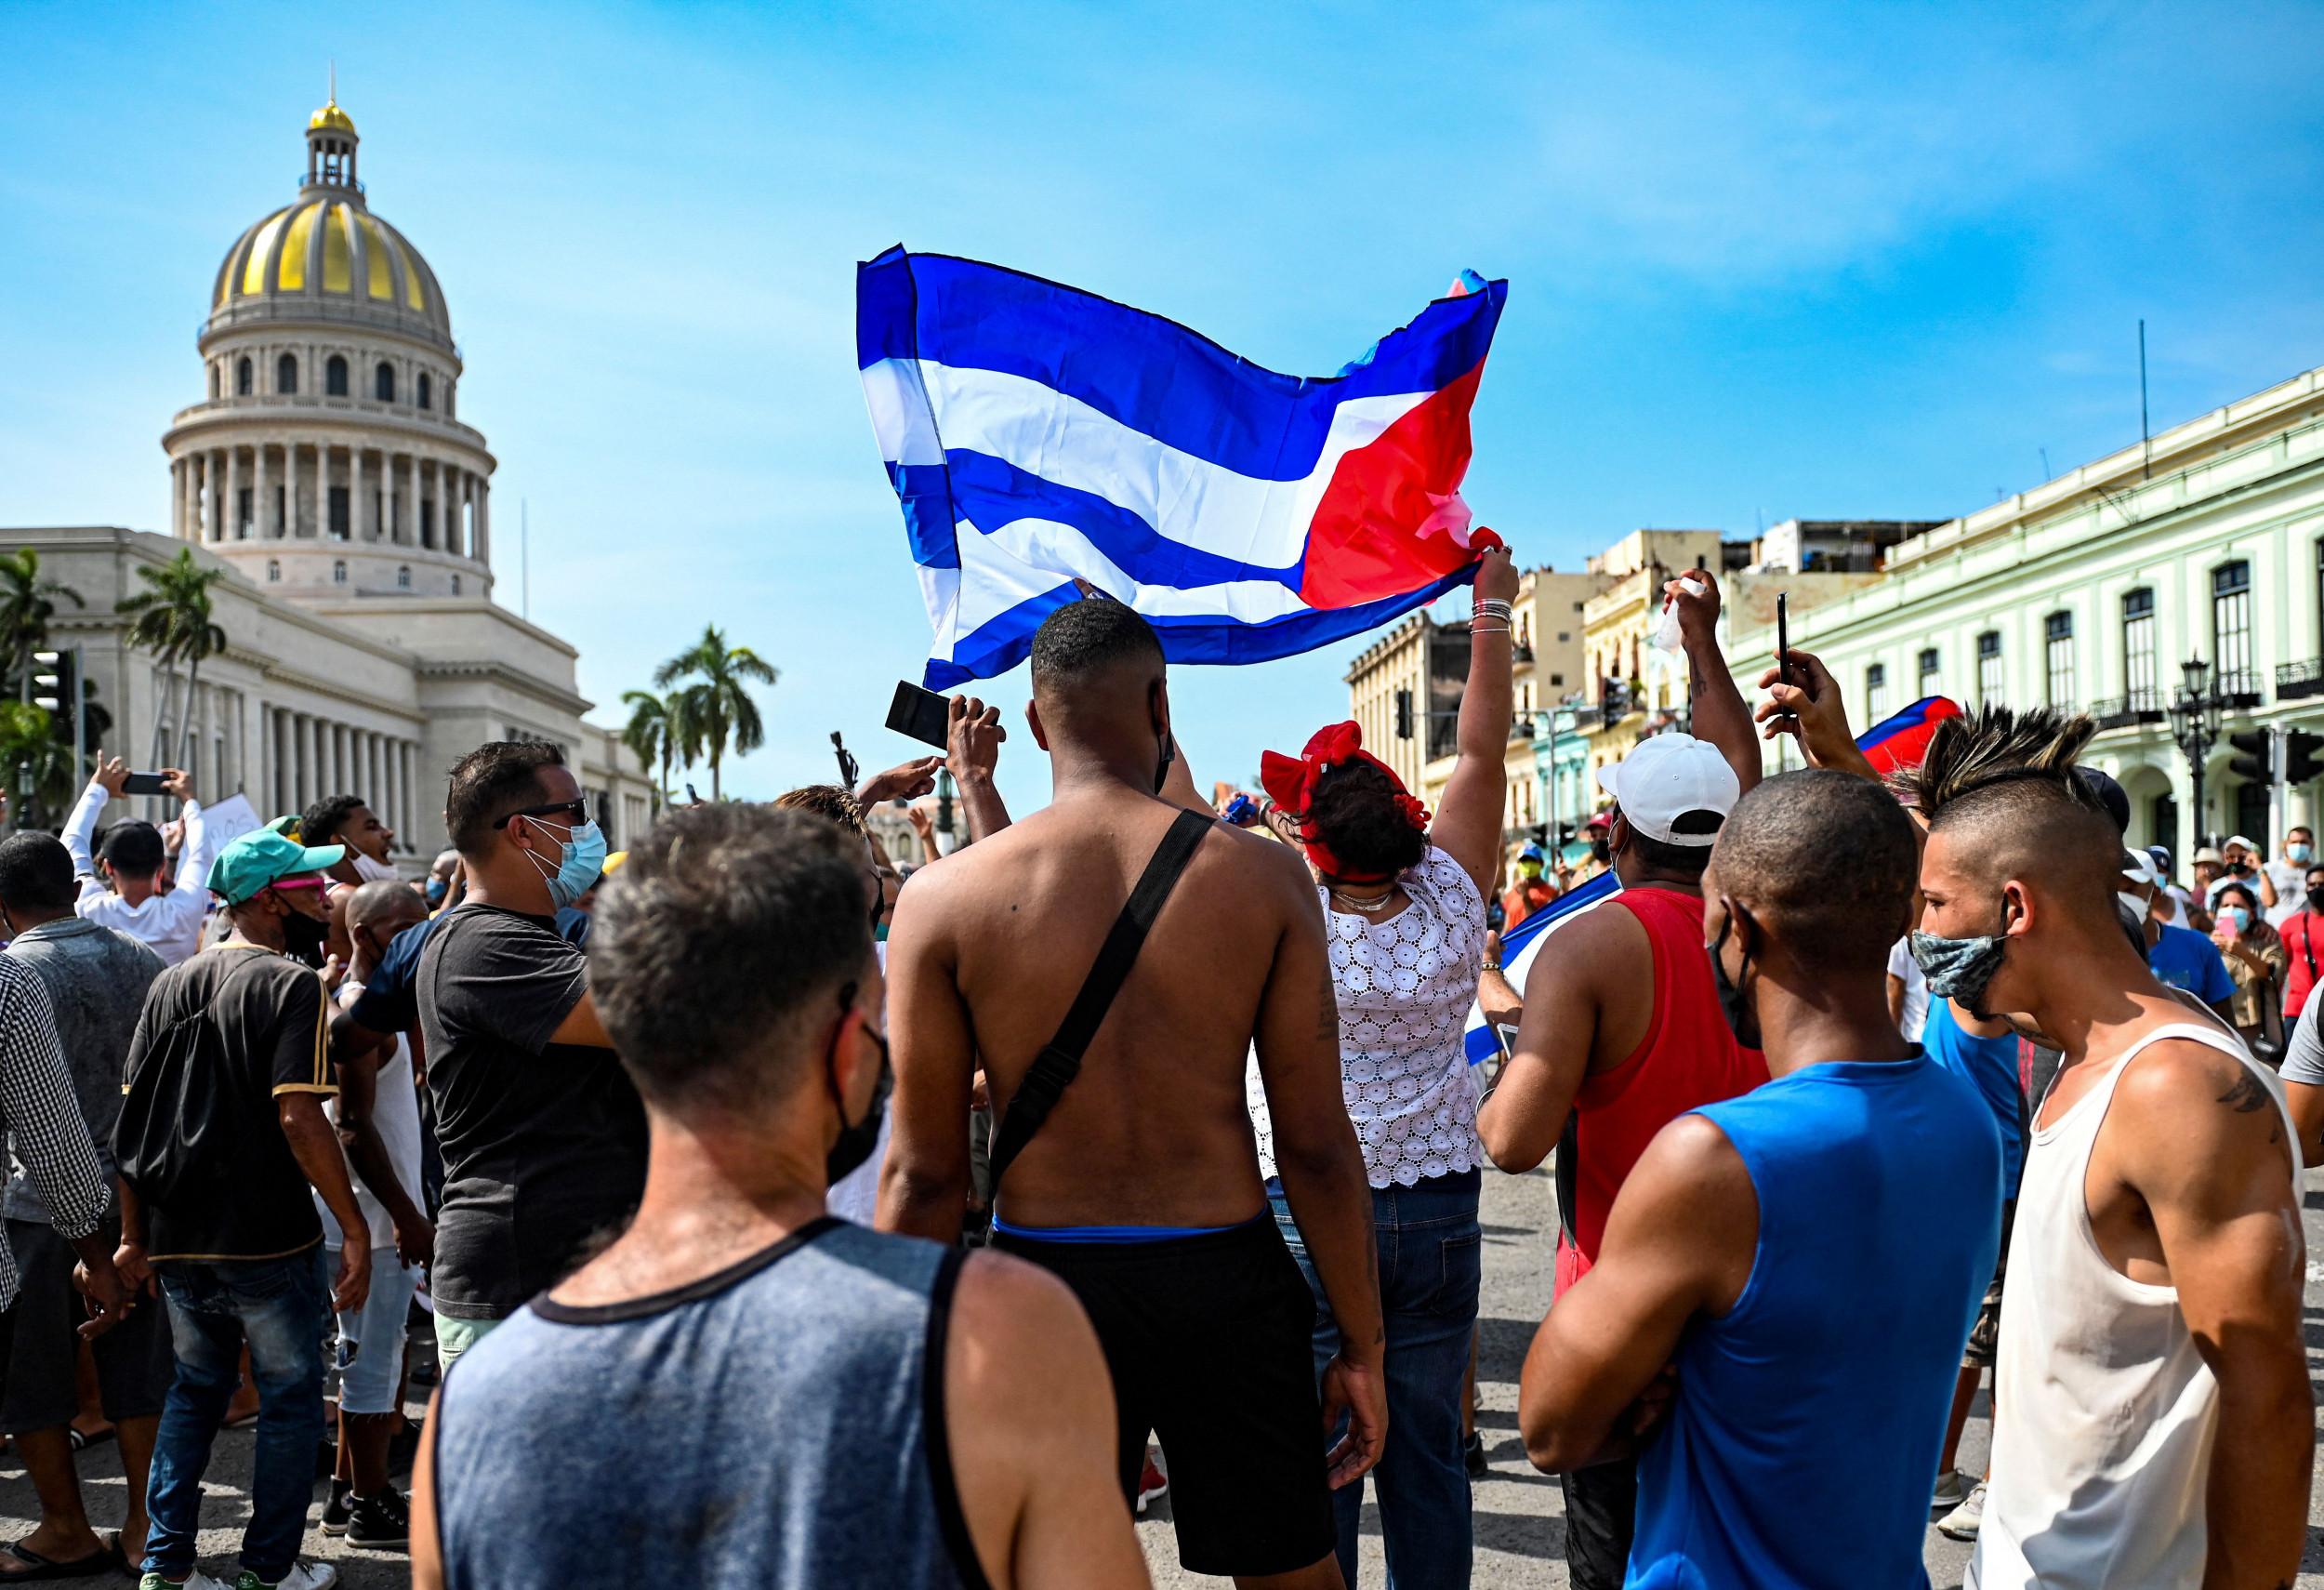 Cuba demonstration